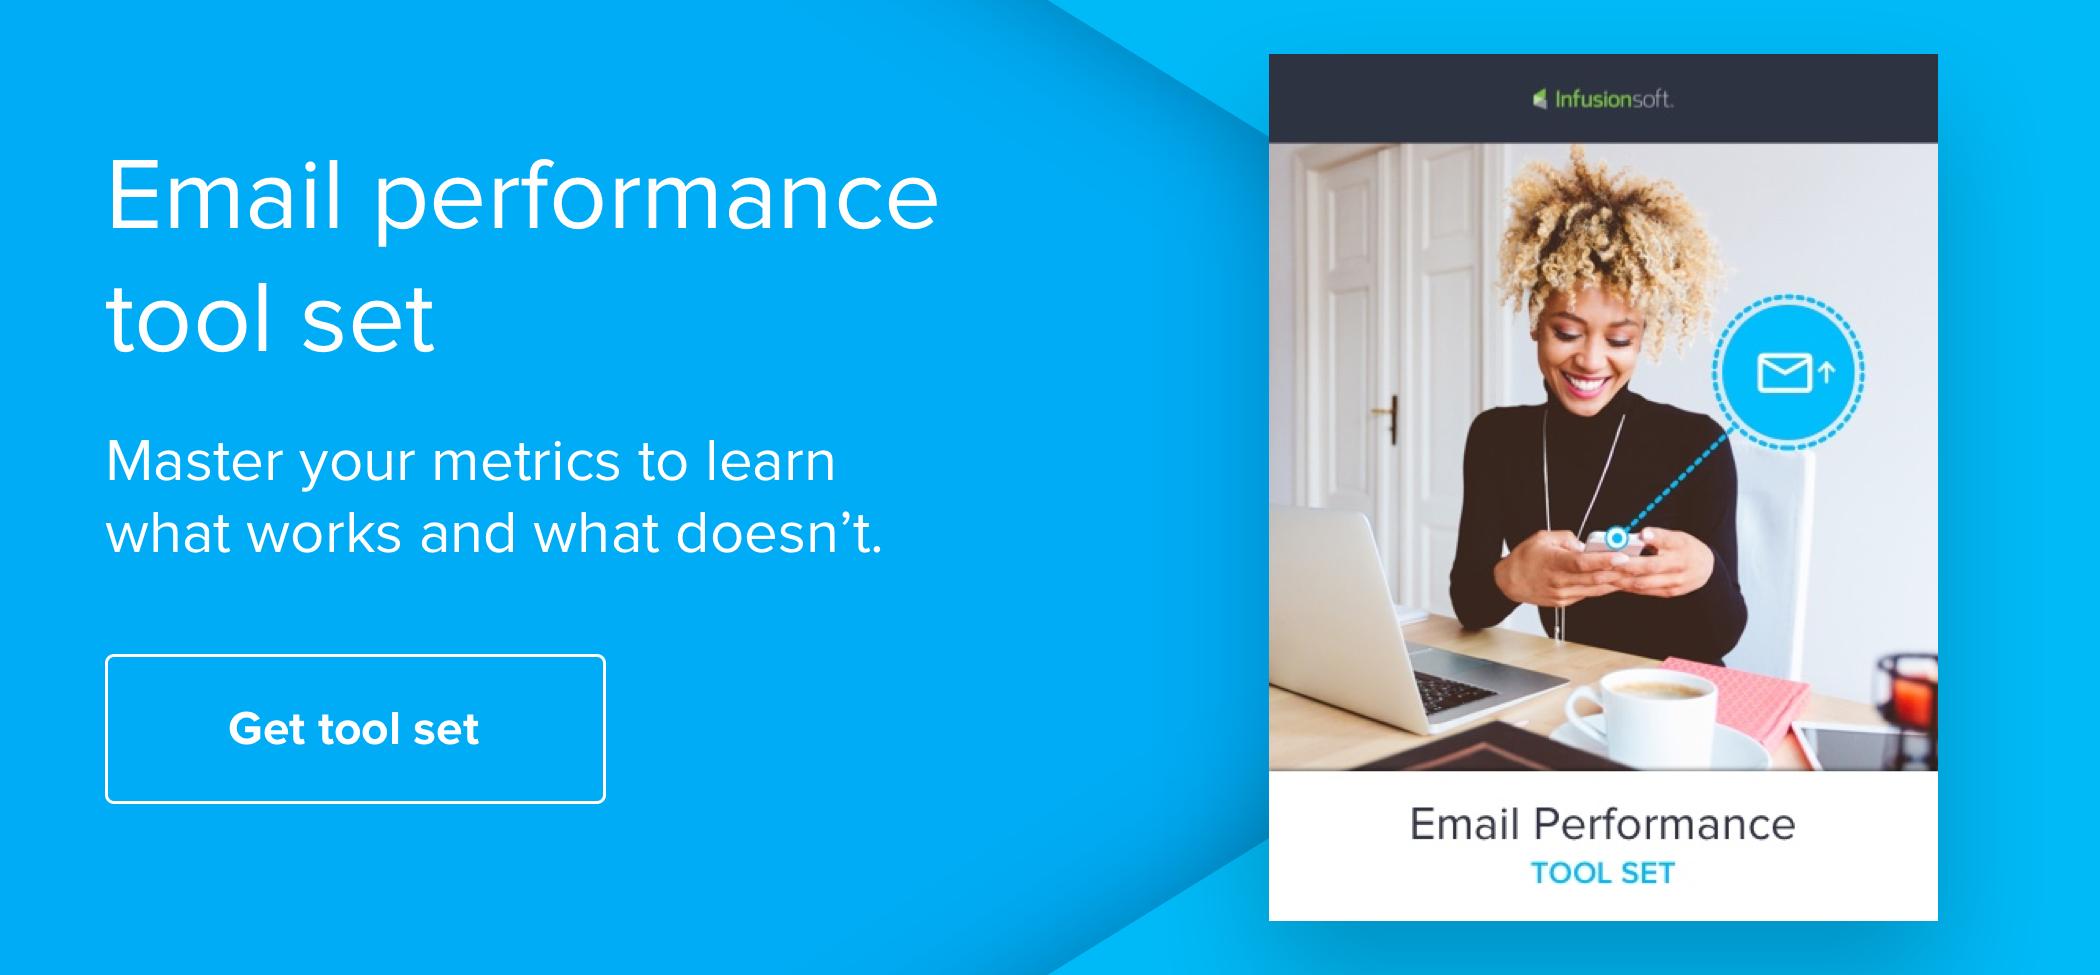 email performance tool set cta.png